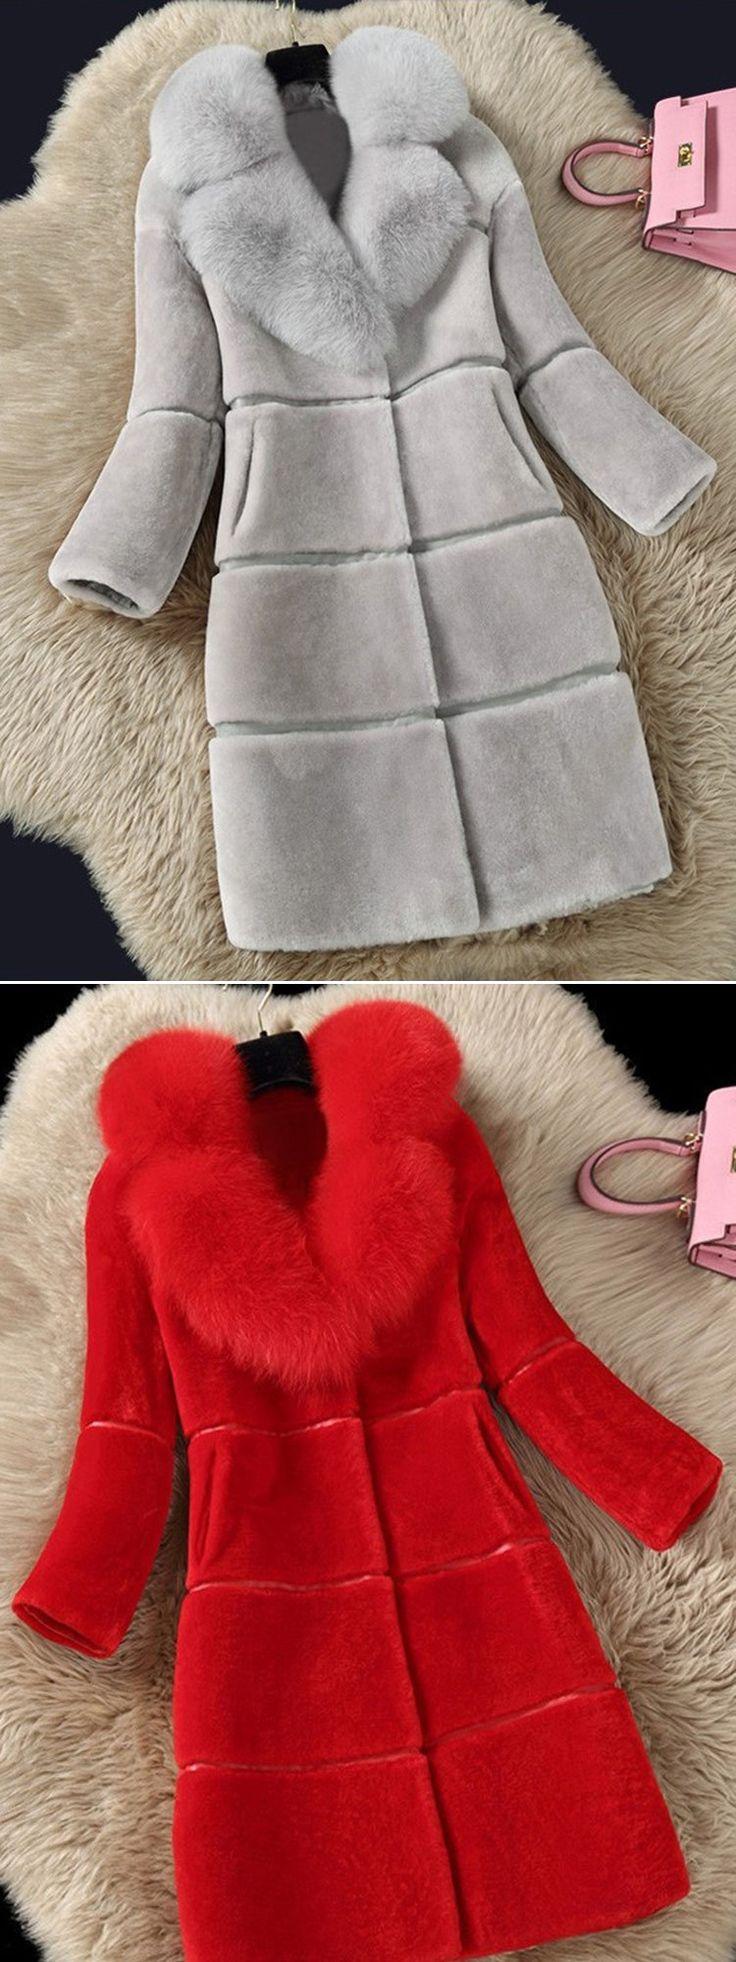 Warm Winter Solid Color Long Sleeve Faux Fur Coat